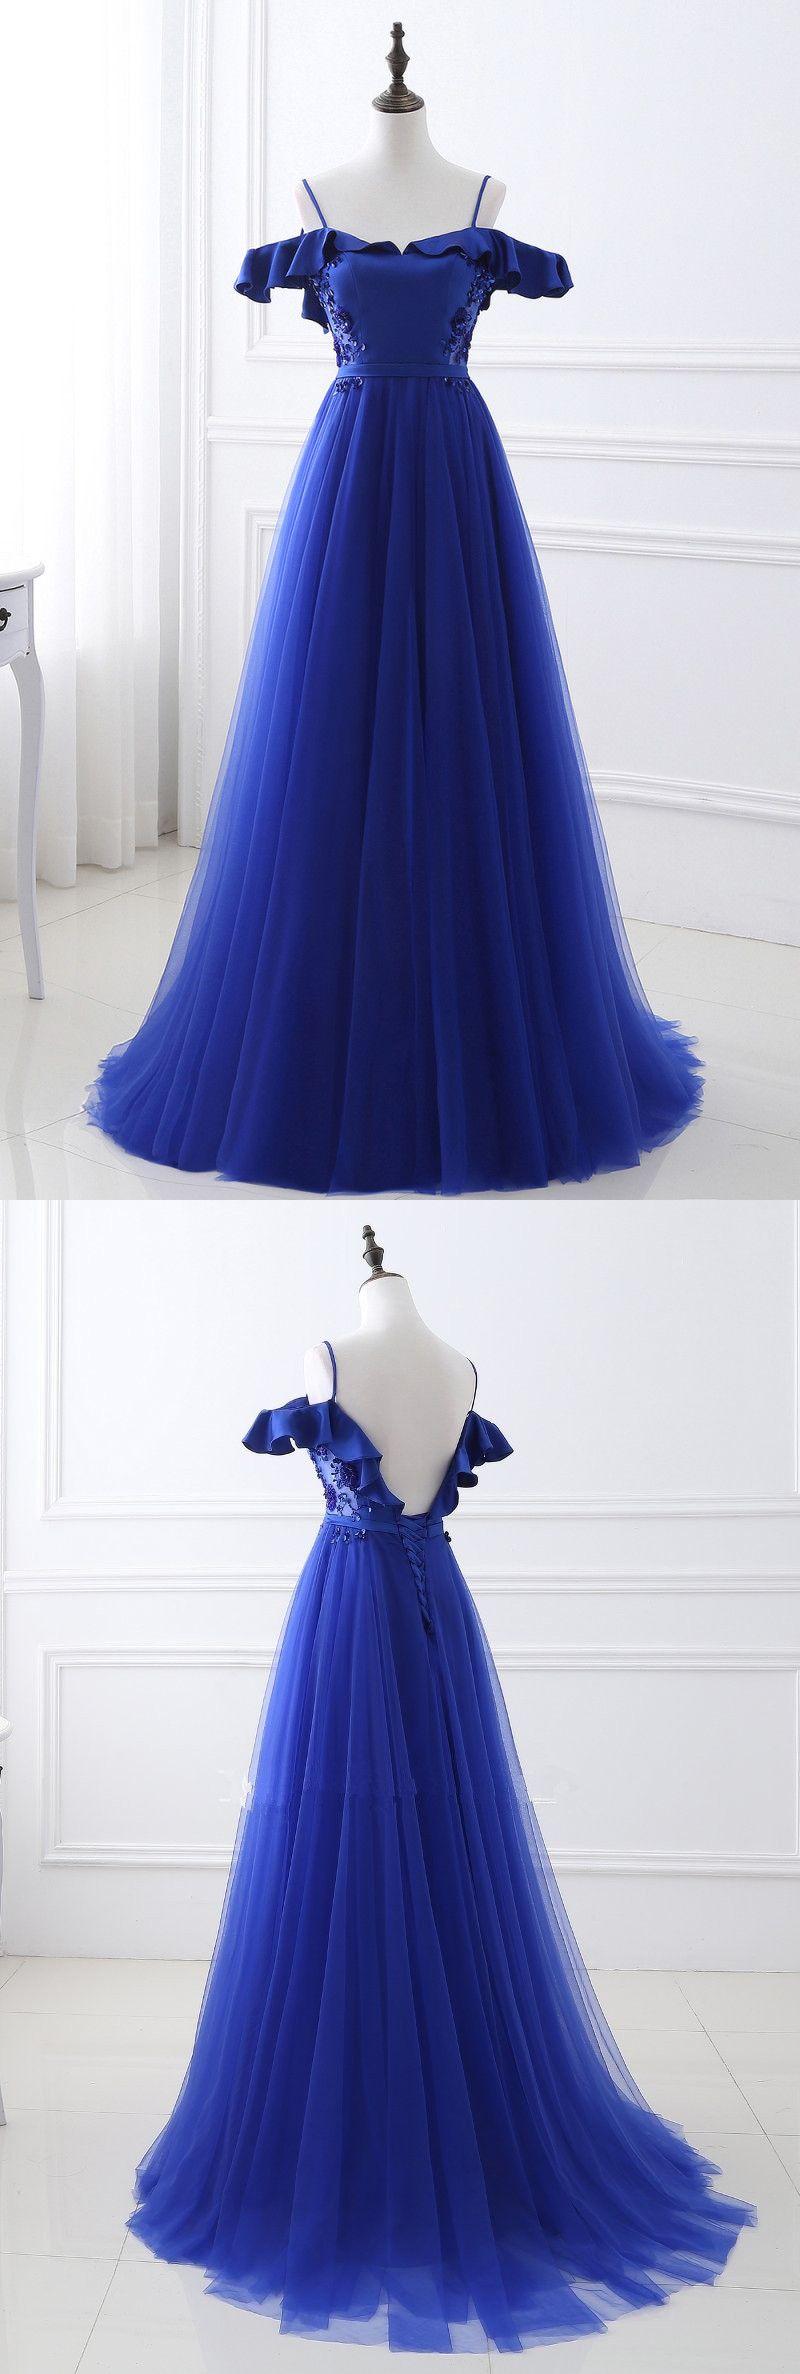 Unique royal blue spaghetti straps prom dressoff the shoulder